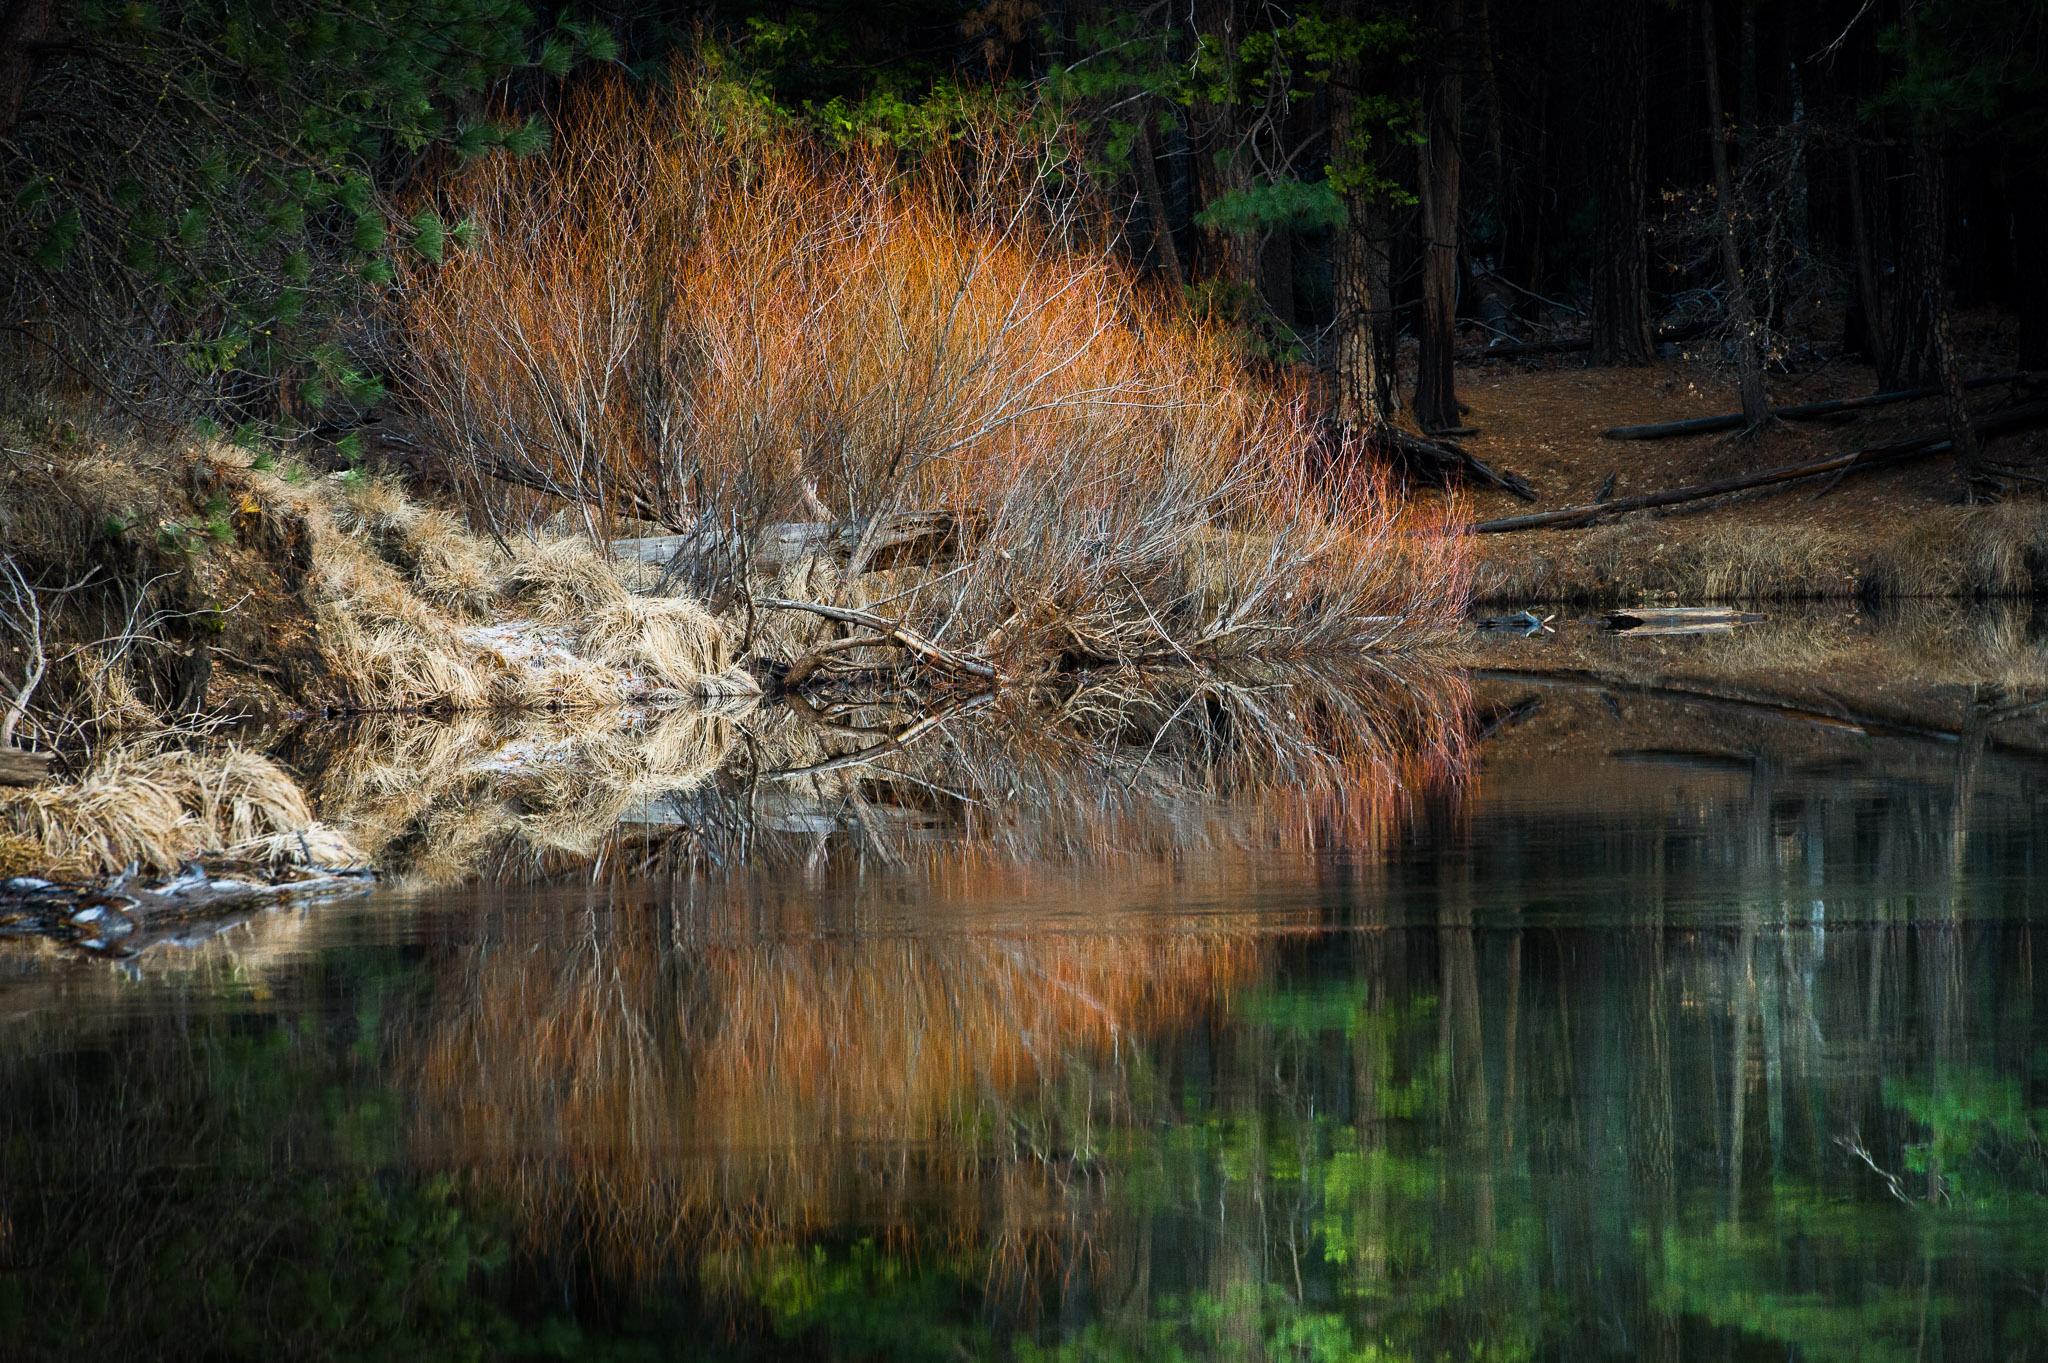 Jason-Davis-Images-Yosemite-0017.jpg